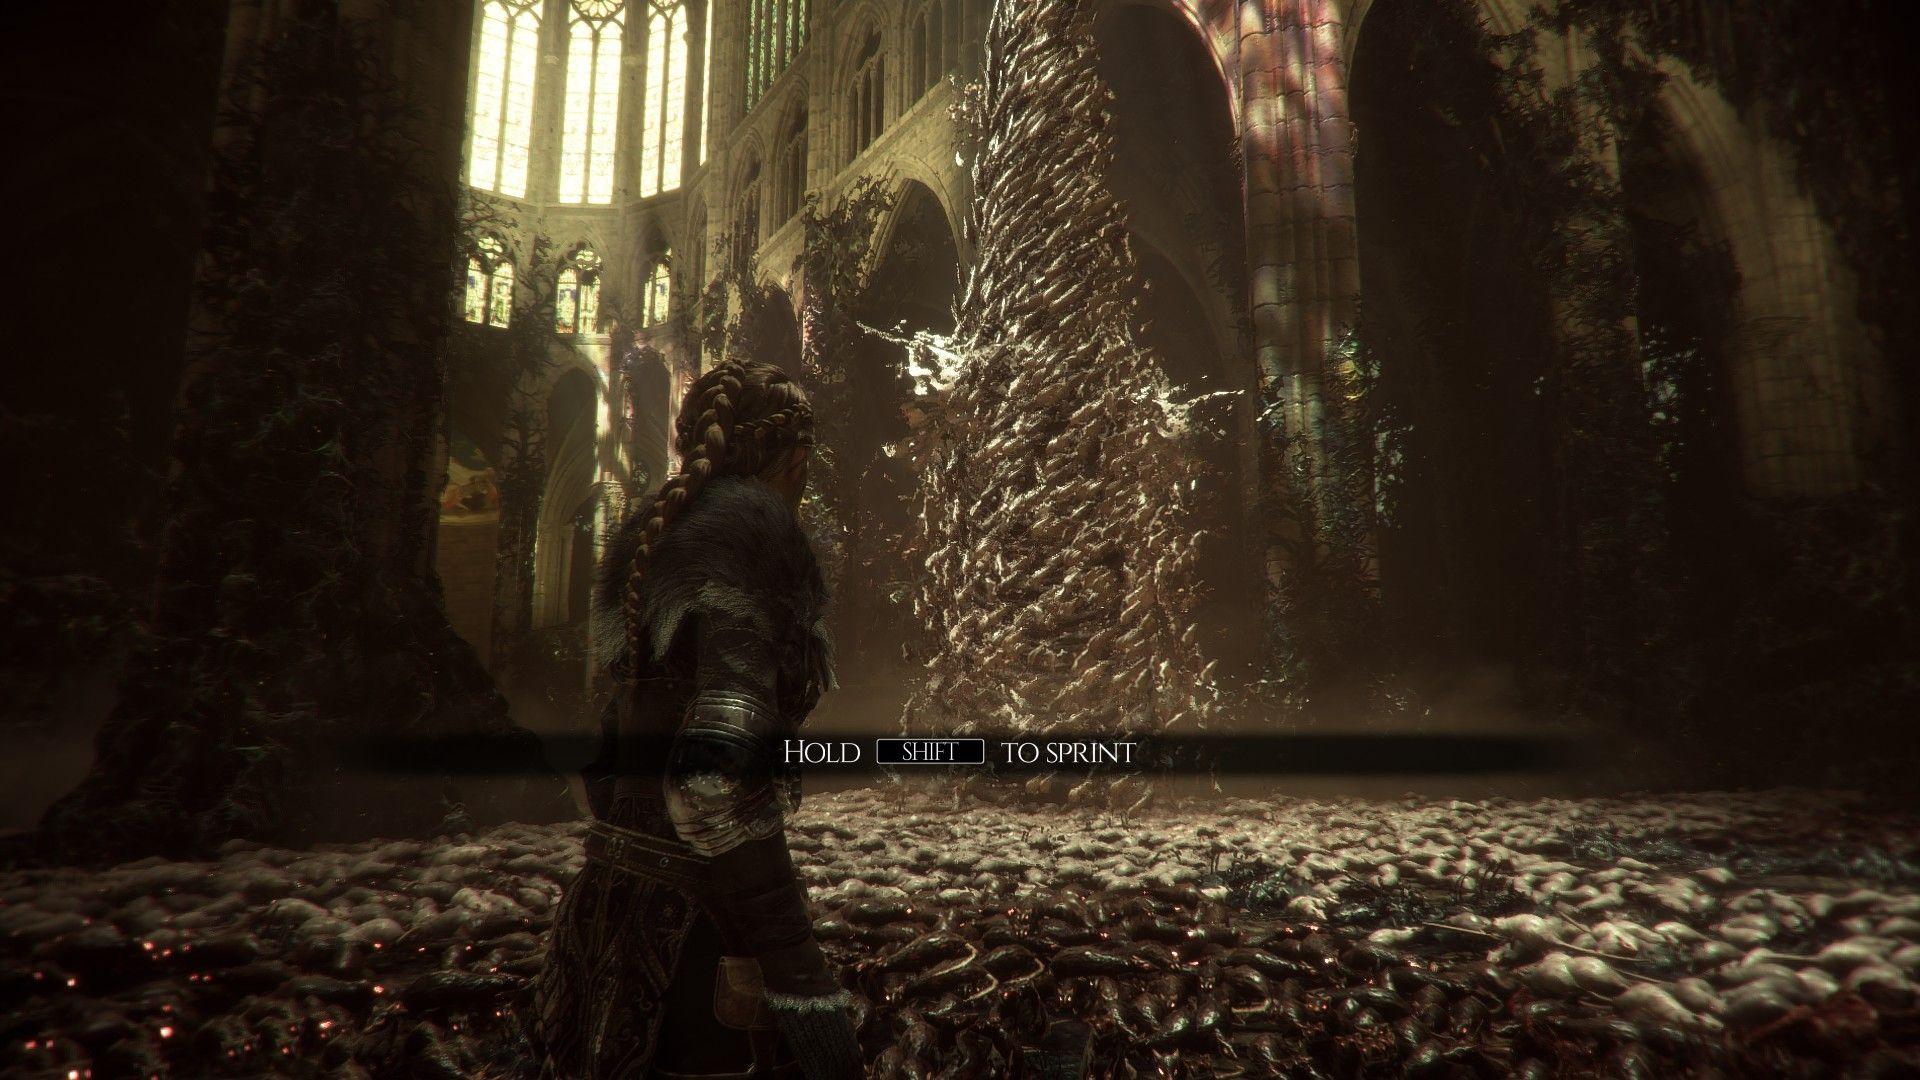 A Plague Tale: Innocence HD Wallpapers - Wallpaper Cave